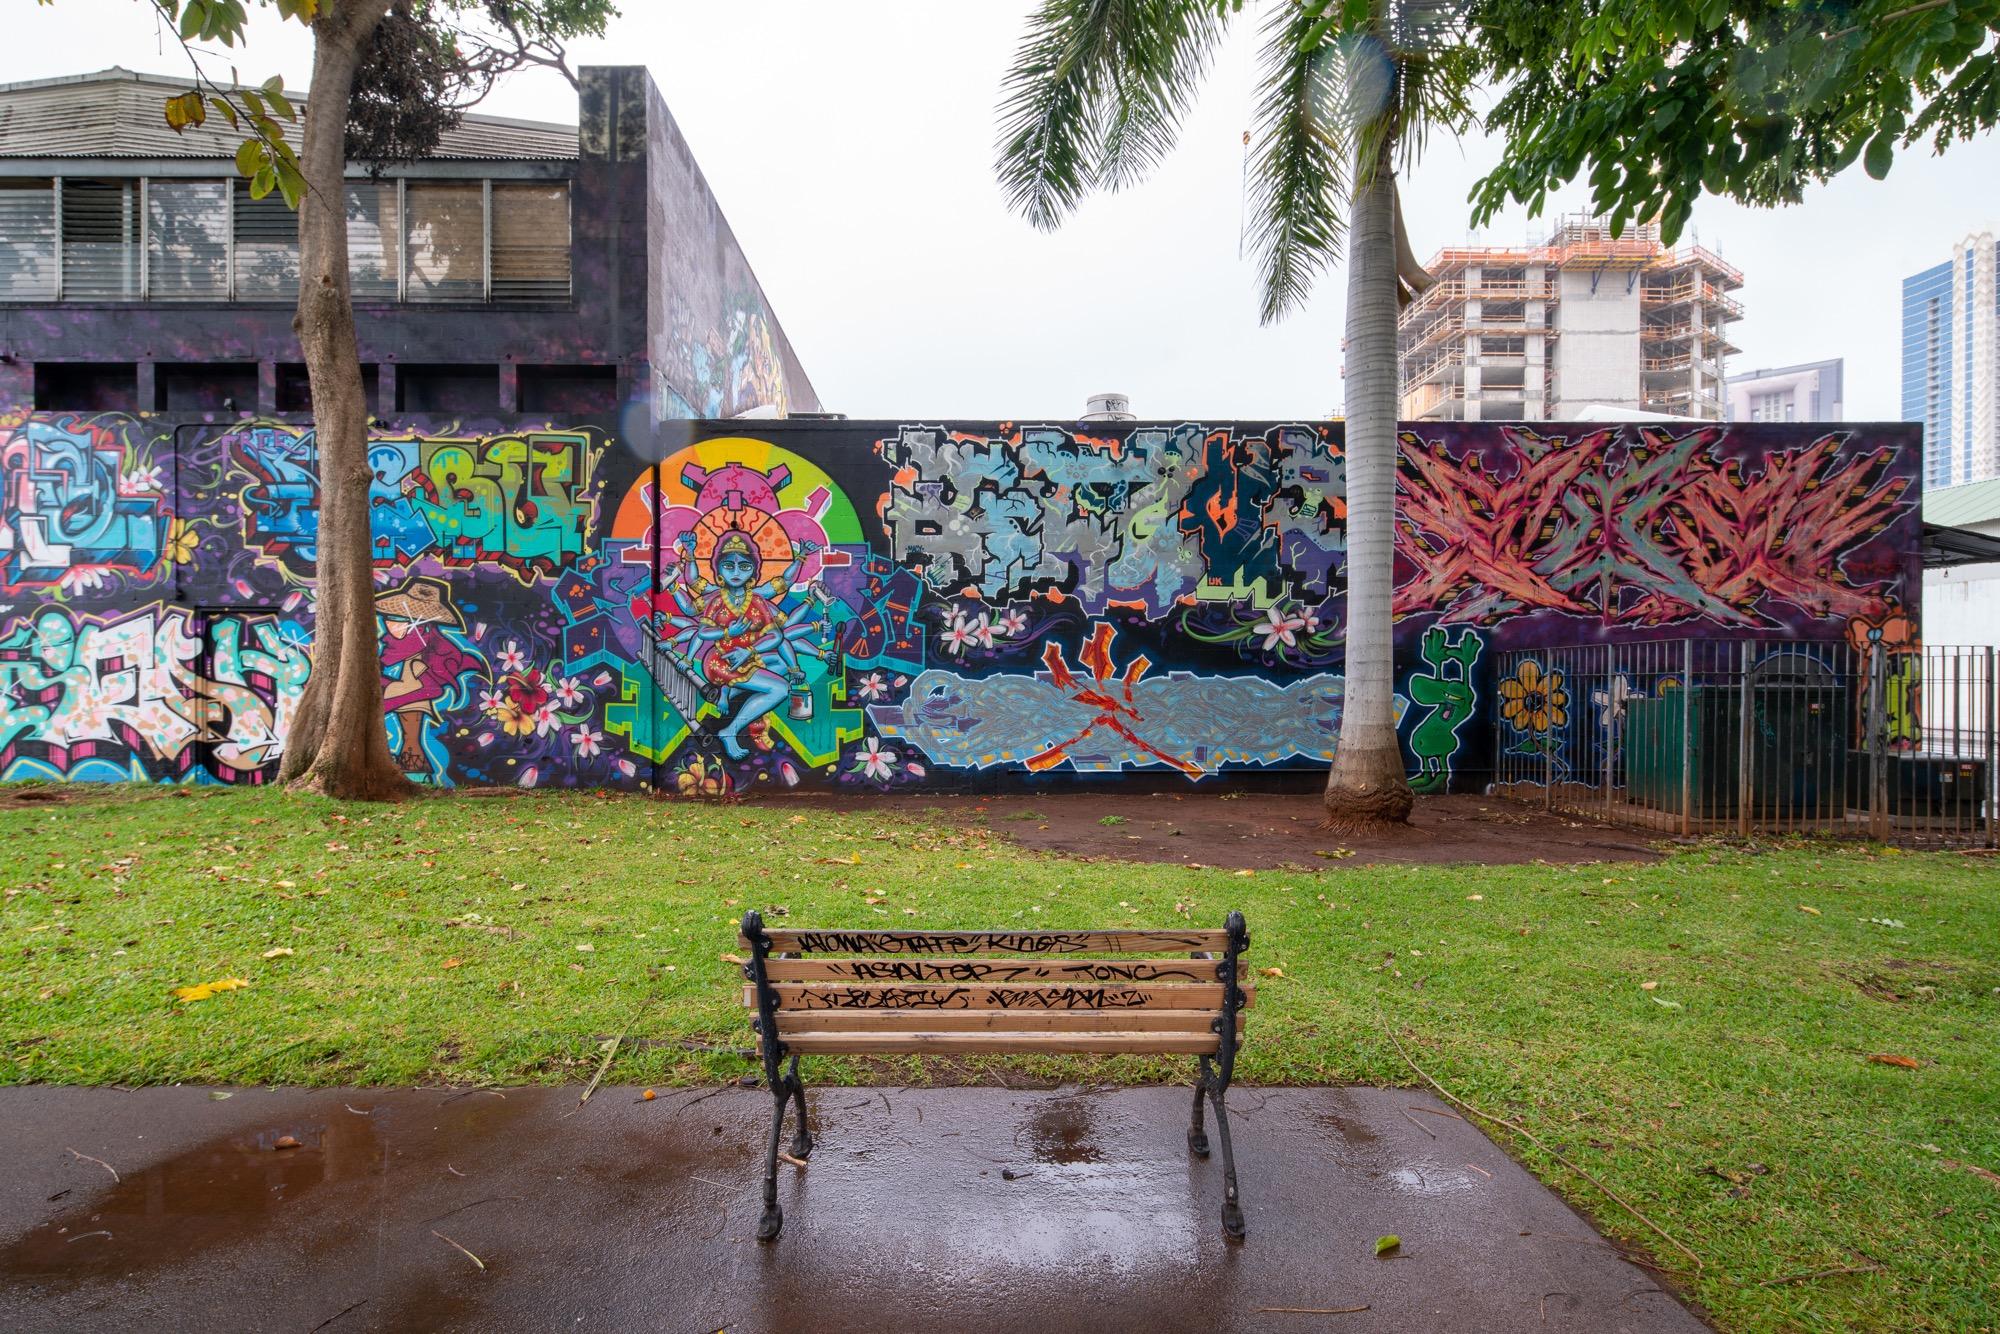 Recap: POW! WOW! Hawaii 2019 Artes & contextos pwh2019 UKCrew 01 mrjasperwong